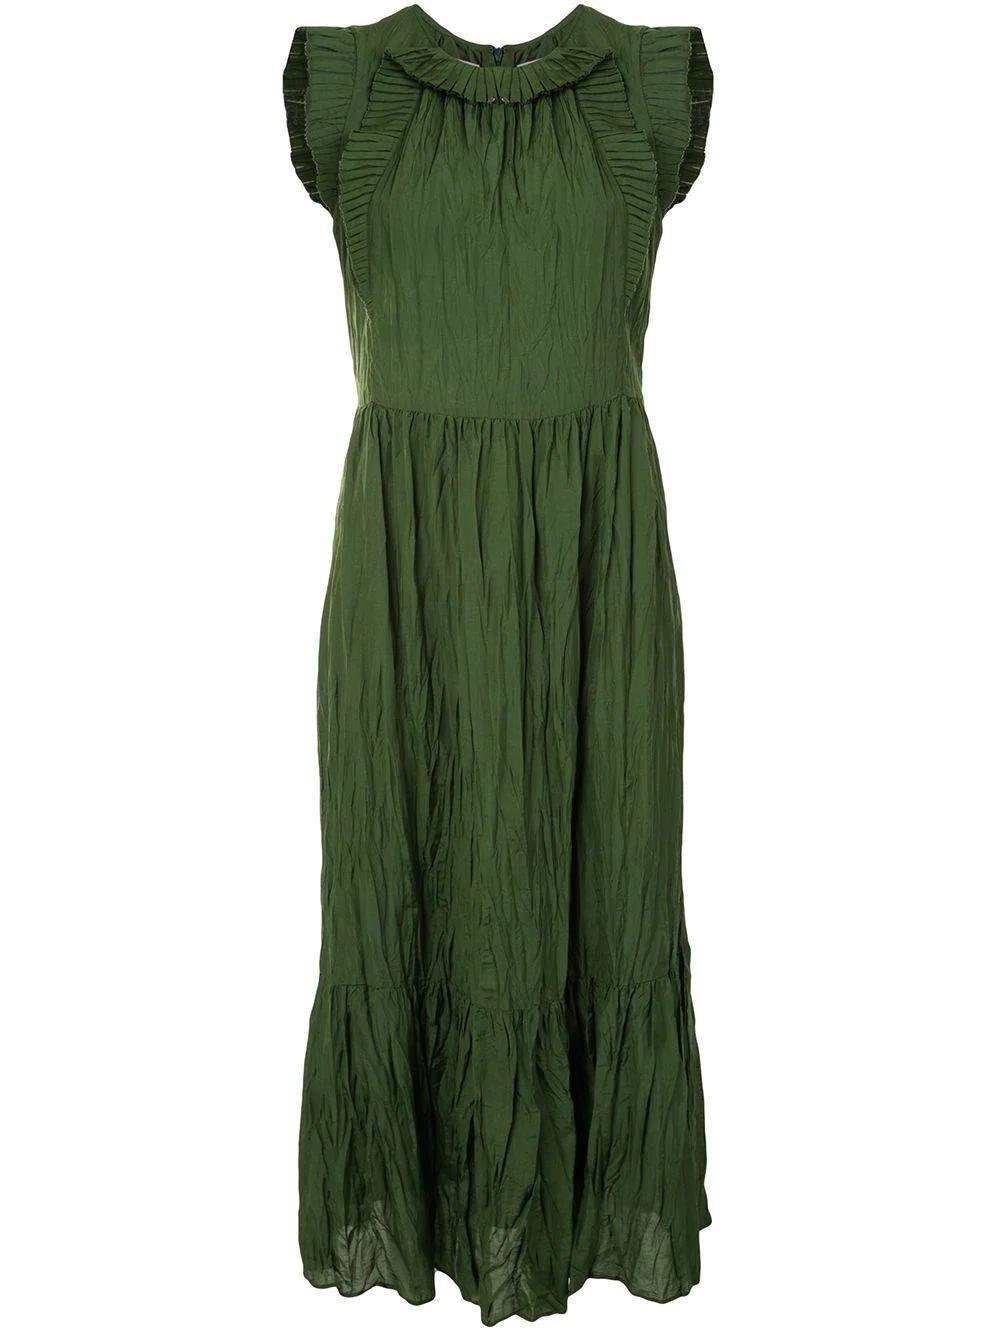 Tessa Dress Item # AW20-98